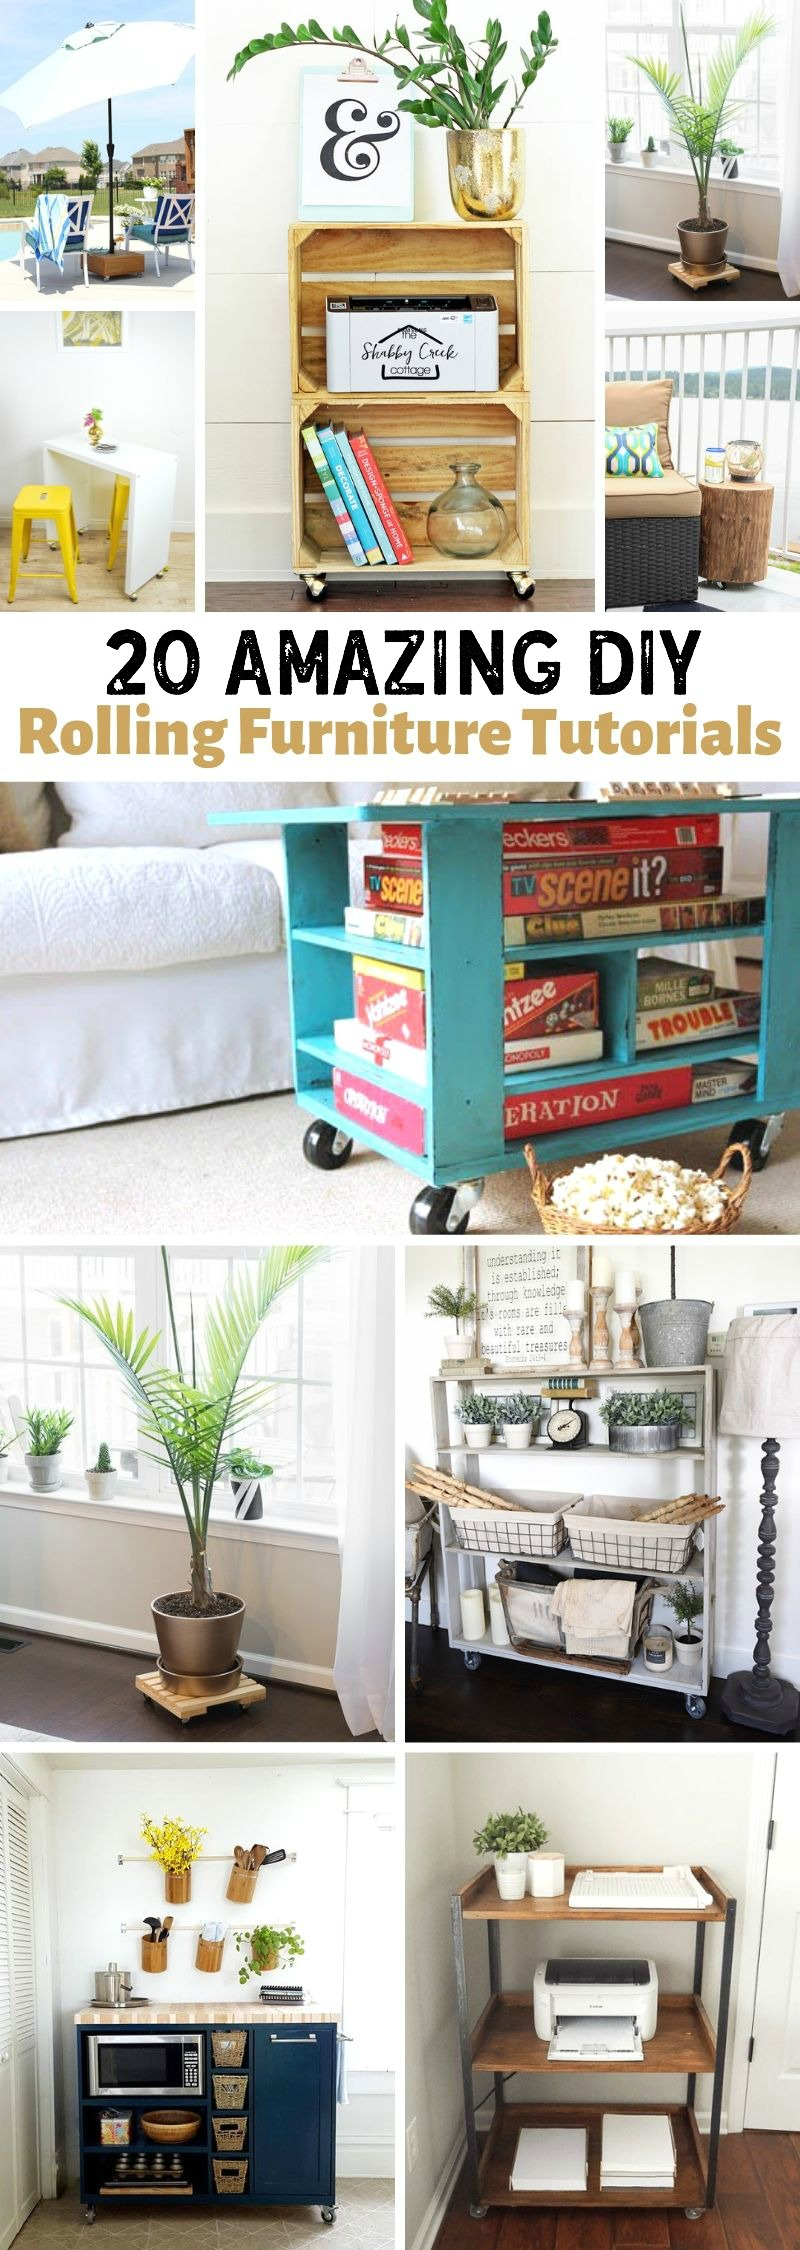 DIY Rolling Furniture